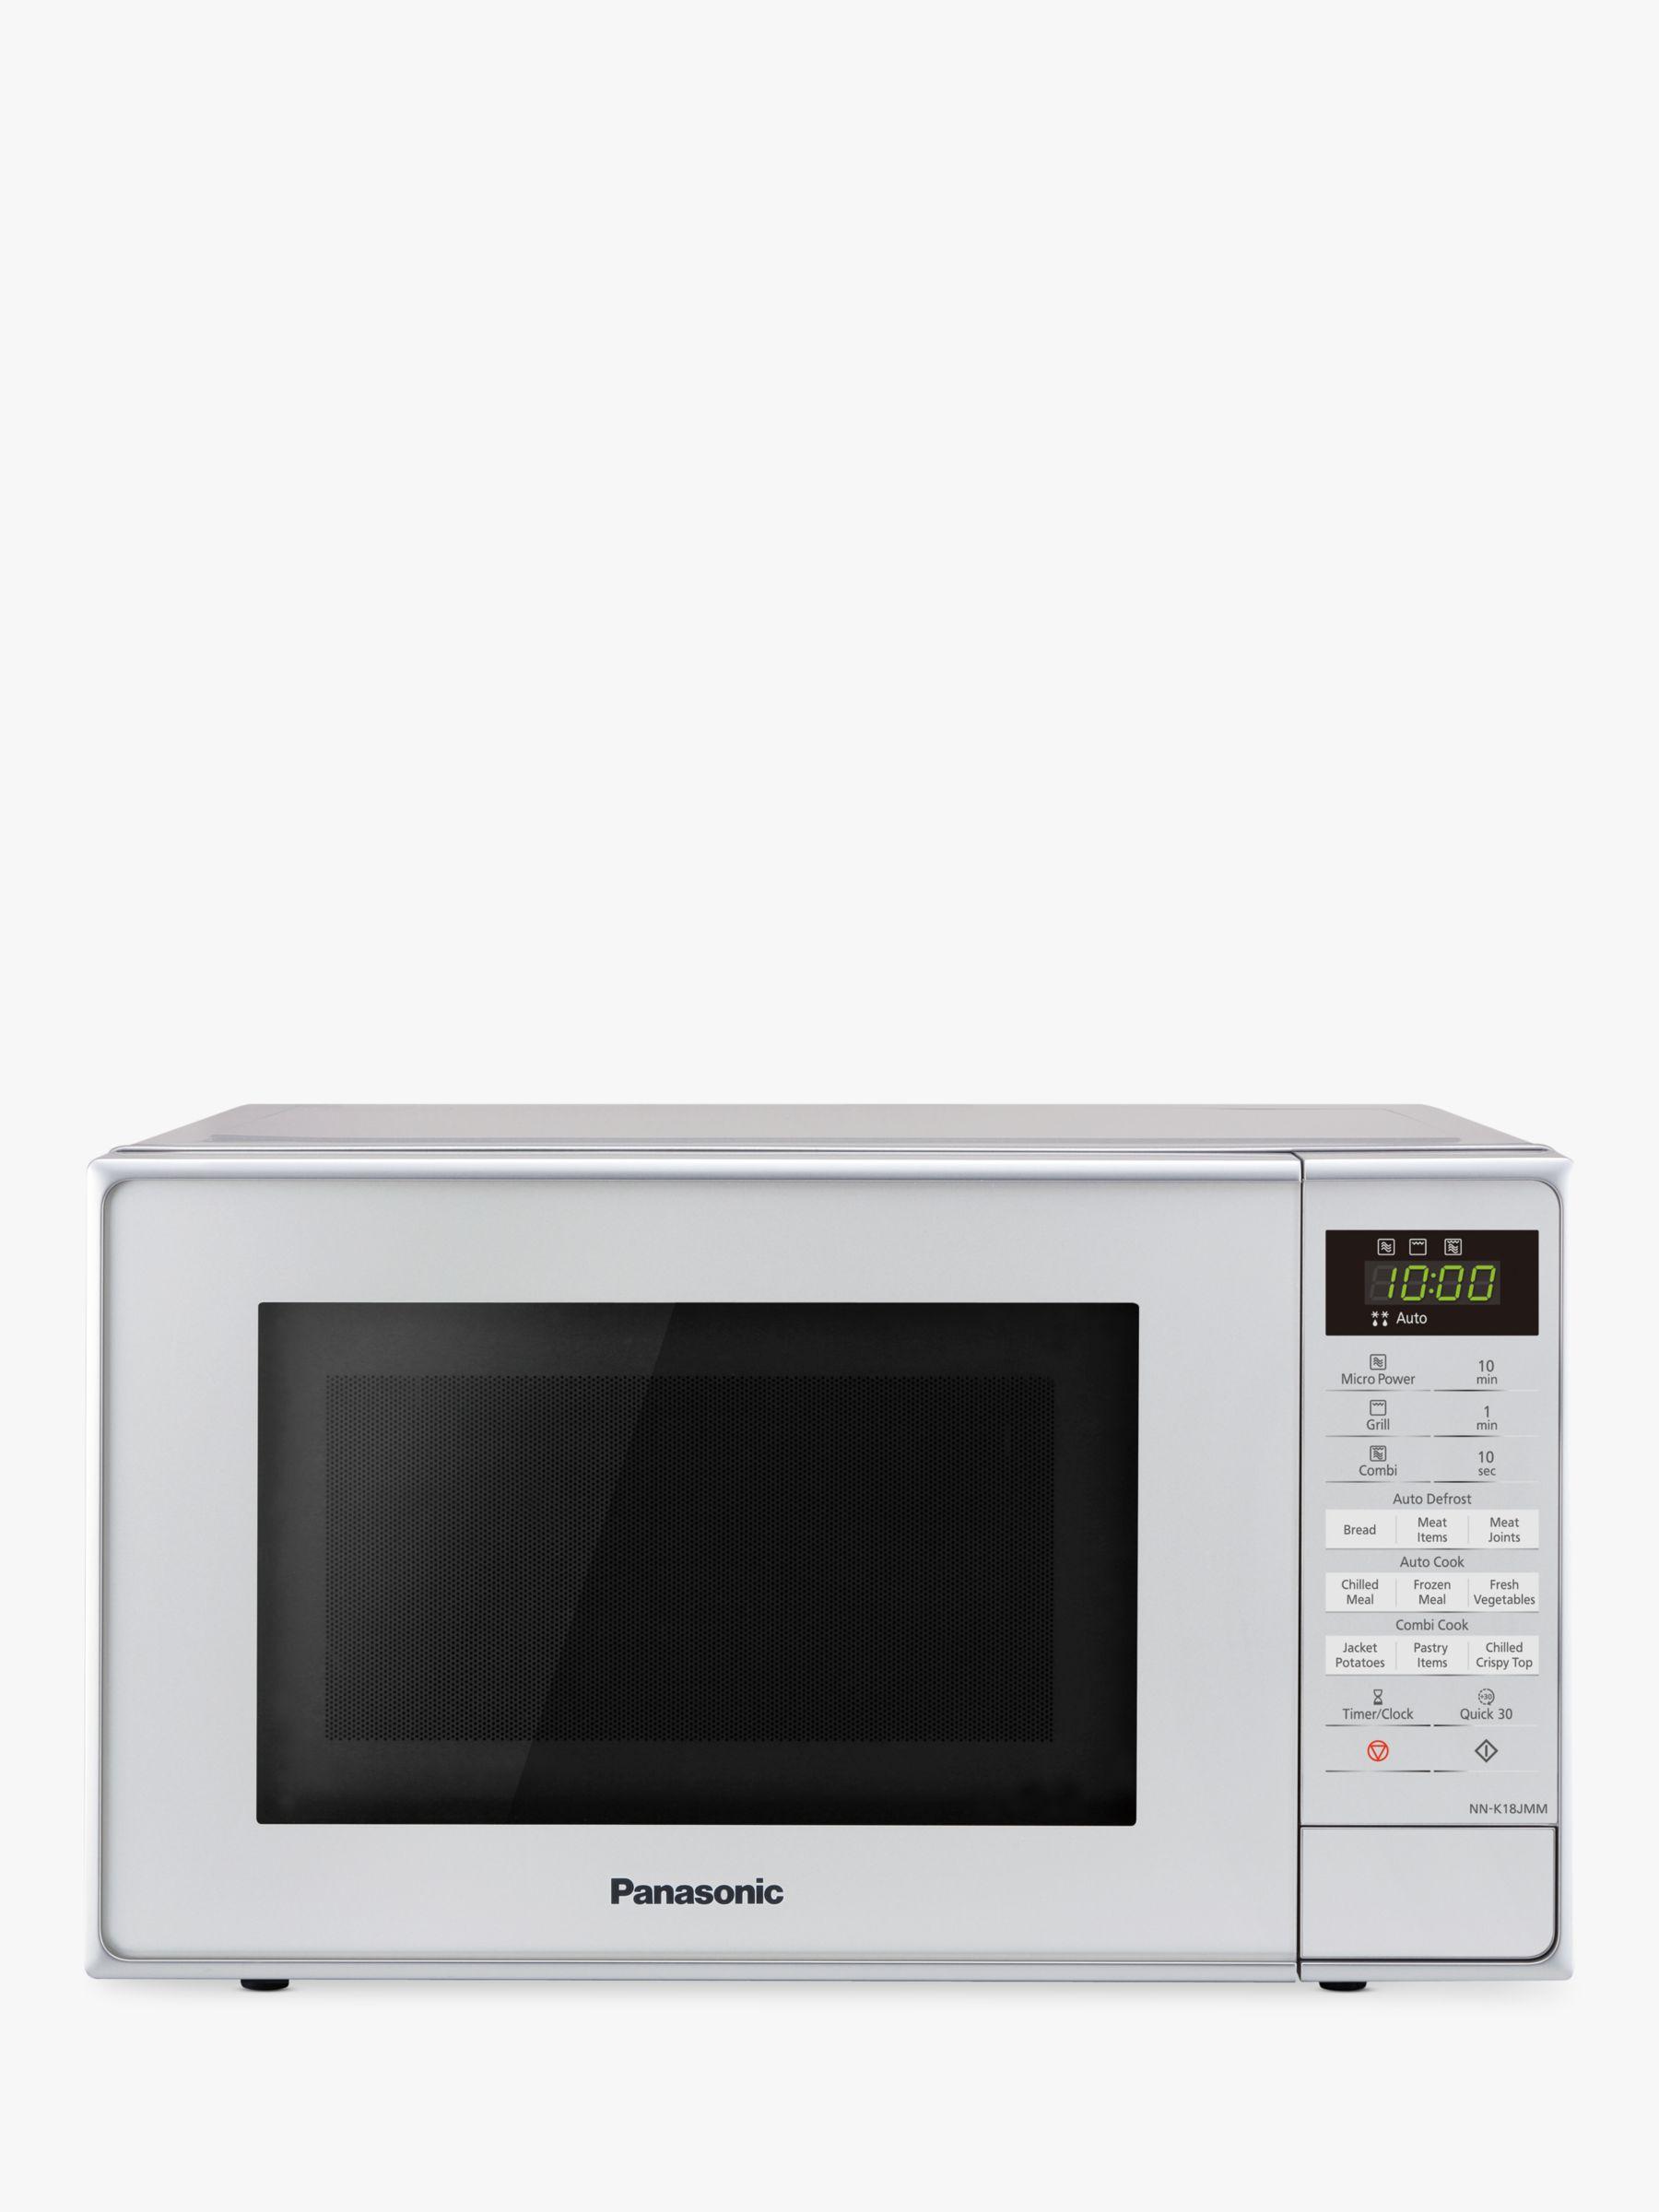 Panasonic Nn K18jmmbpq Freestanding Microwave With Grill Silver